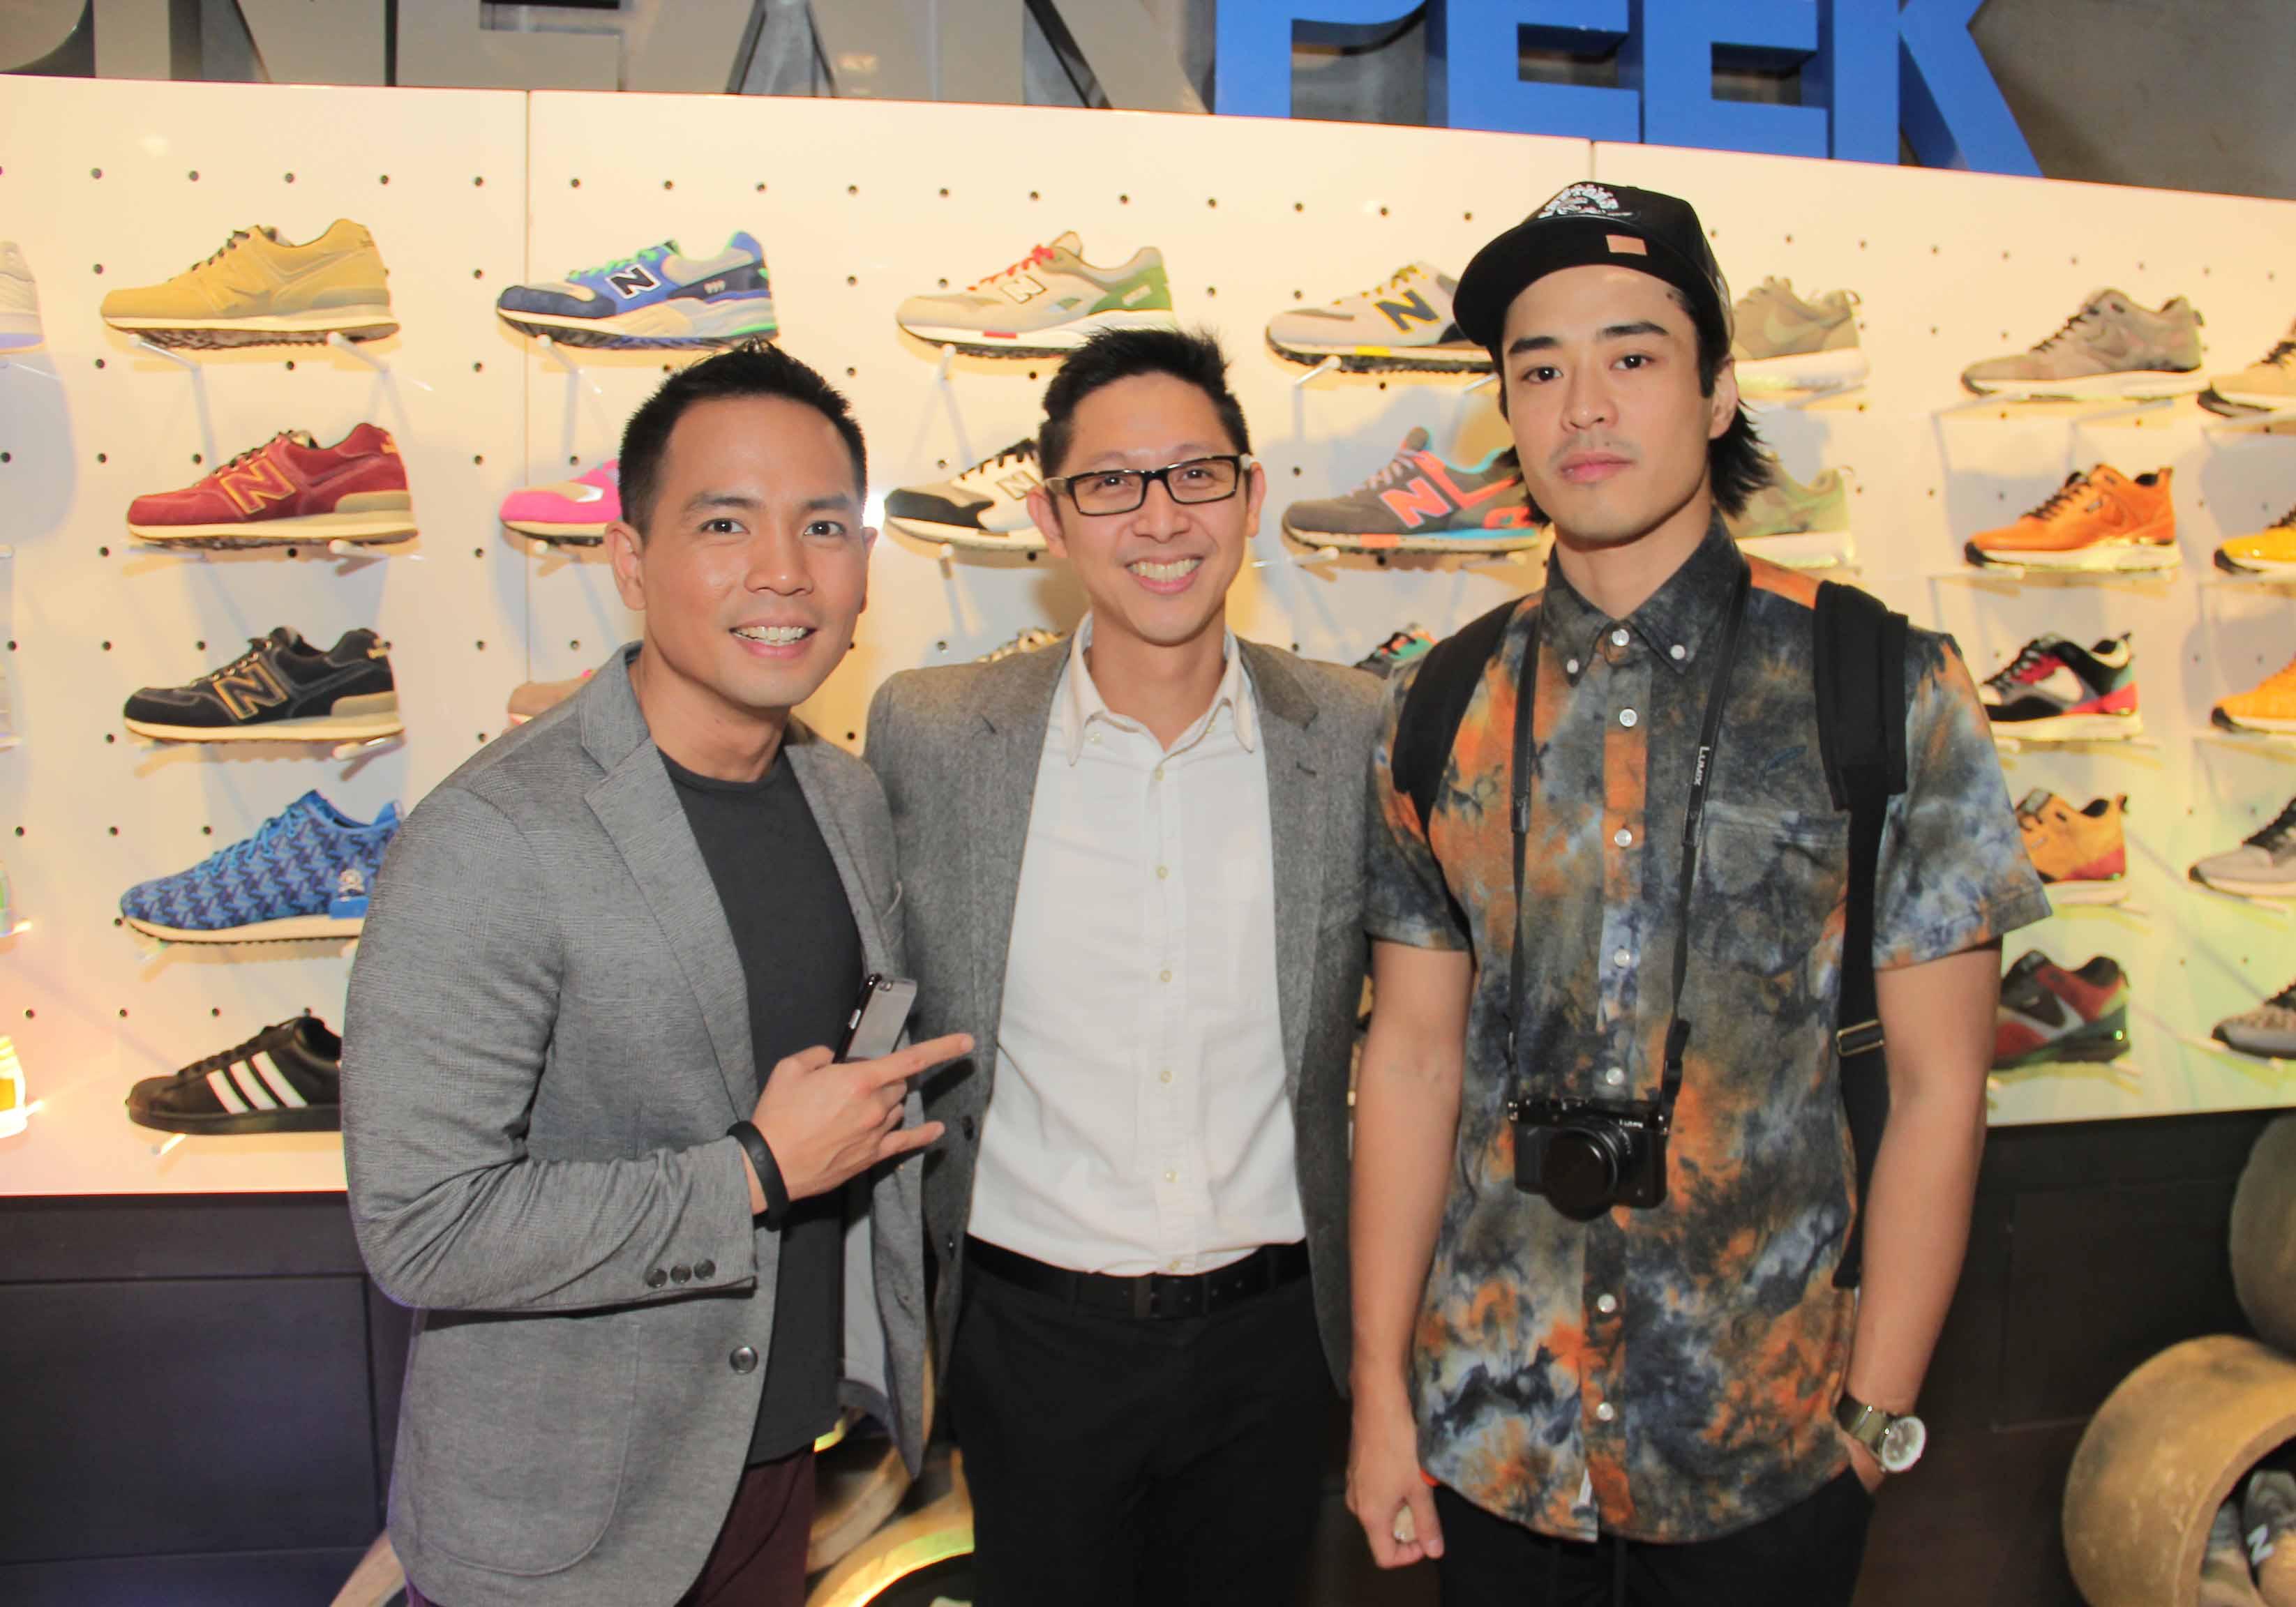 Host Jinno Rufino, PGII's AVP & SBU Head Toti Wong, Brent Javier